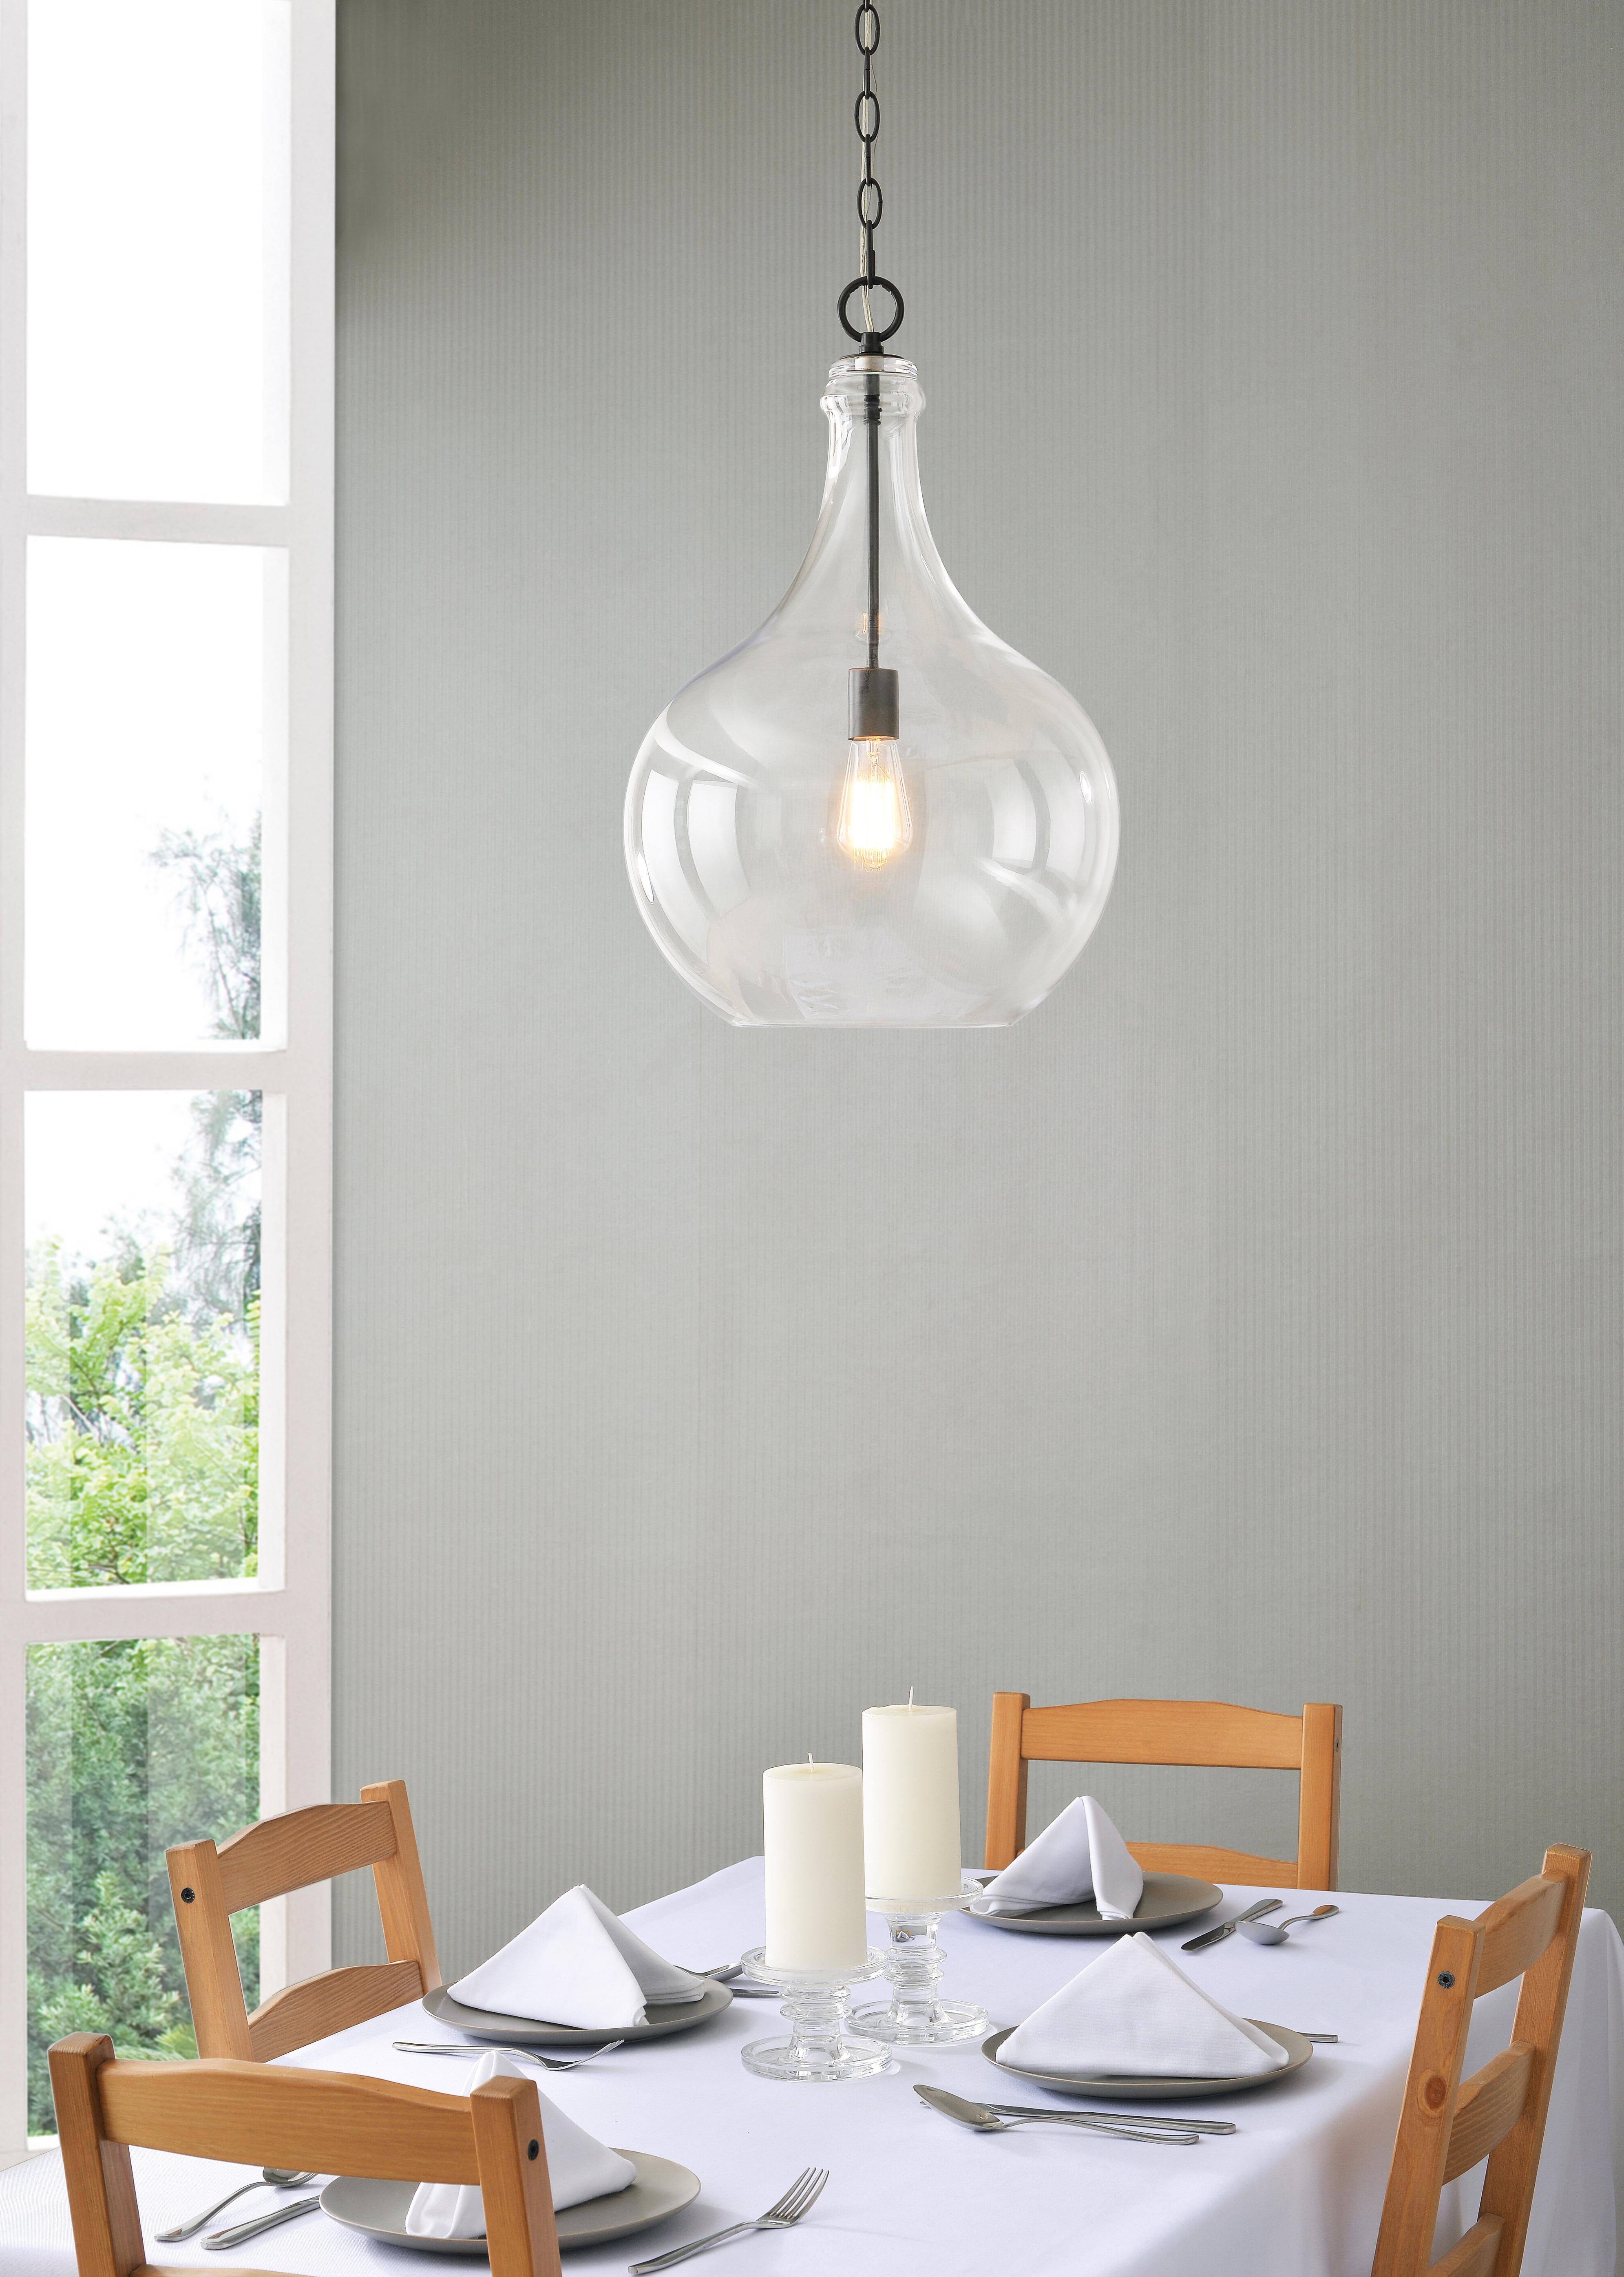 Sussex 1 Light Single Geometric Pendants With Regard To Well Liked Bustillos 1 Light Single Globe Pendant (Gallery 17 of 20)